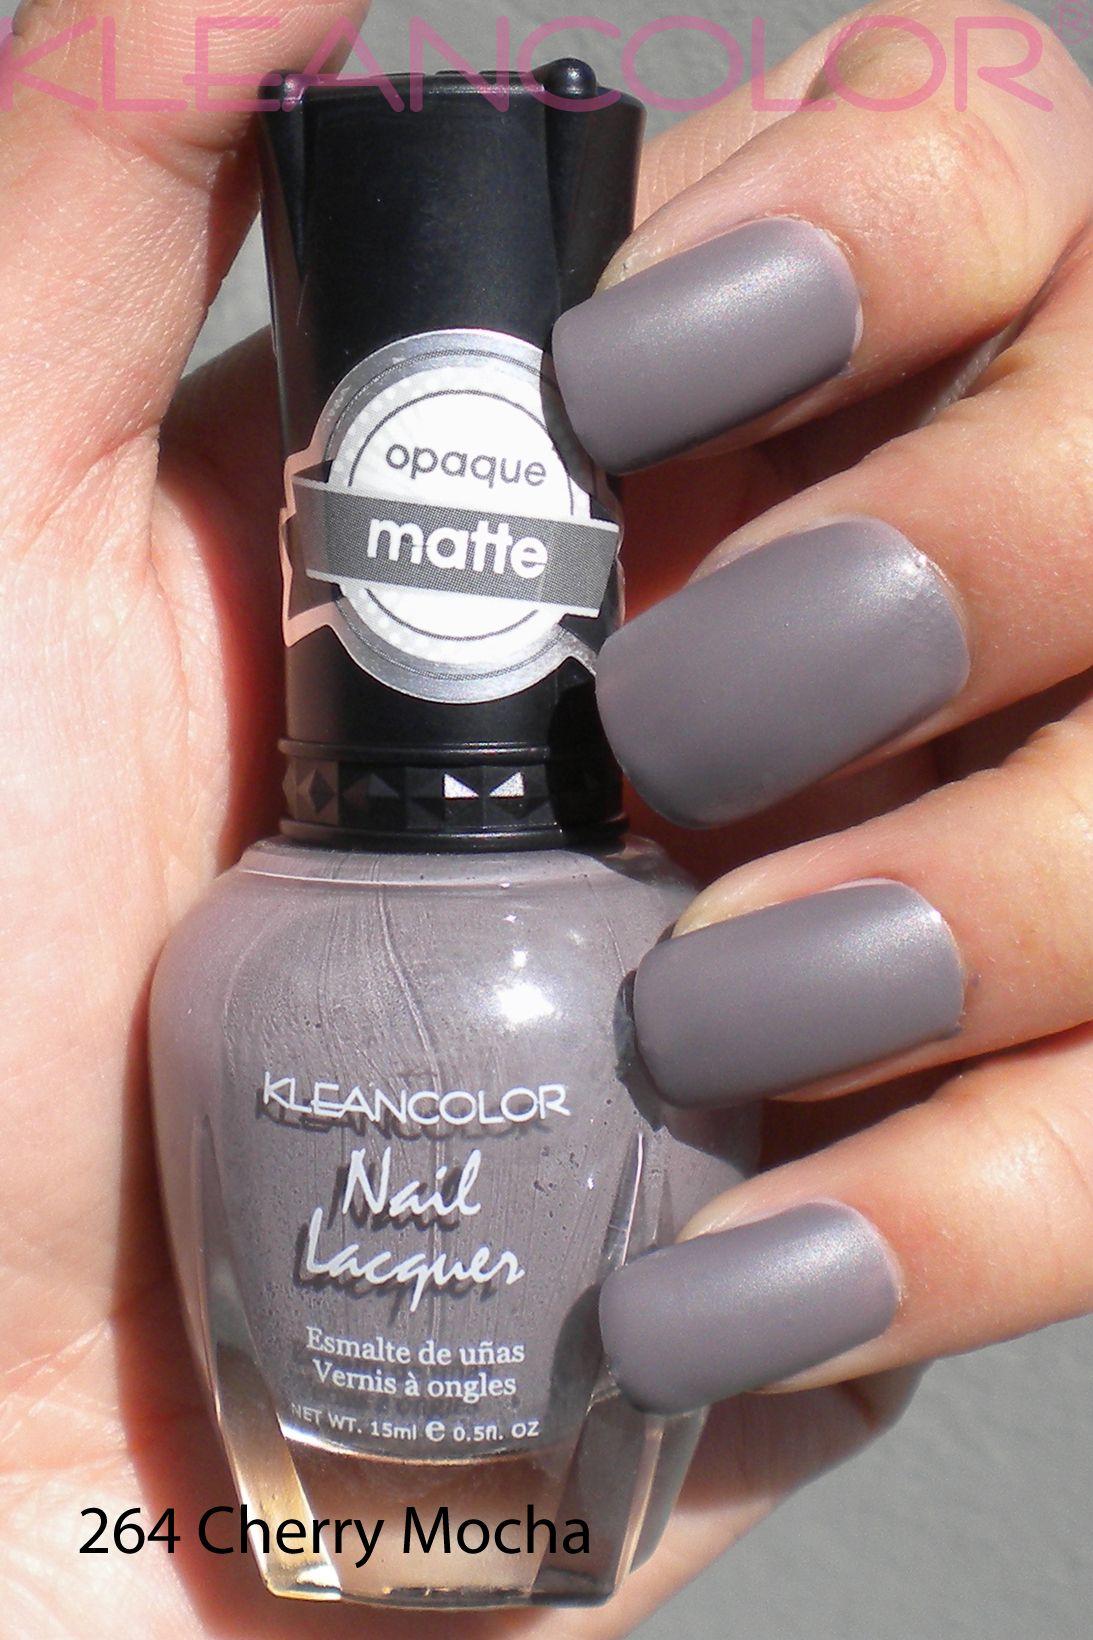 264 Cherry Mocha #mattepolish #matte #polish   Matte Nail Lacquer ...